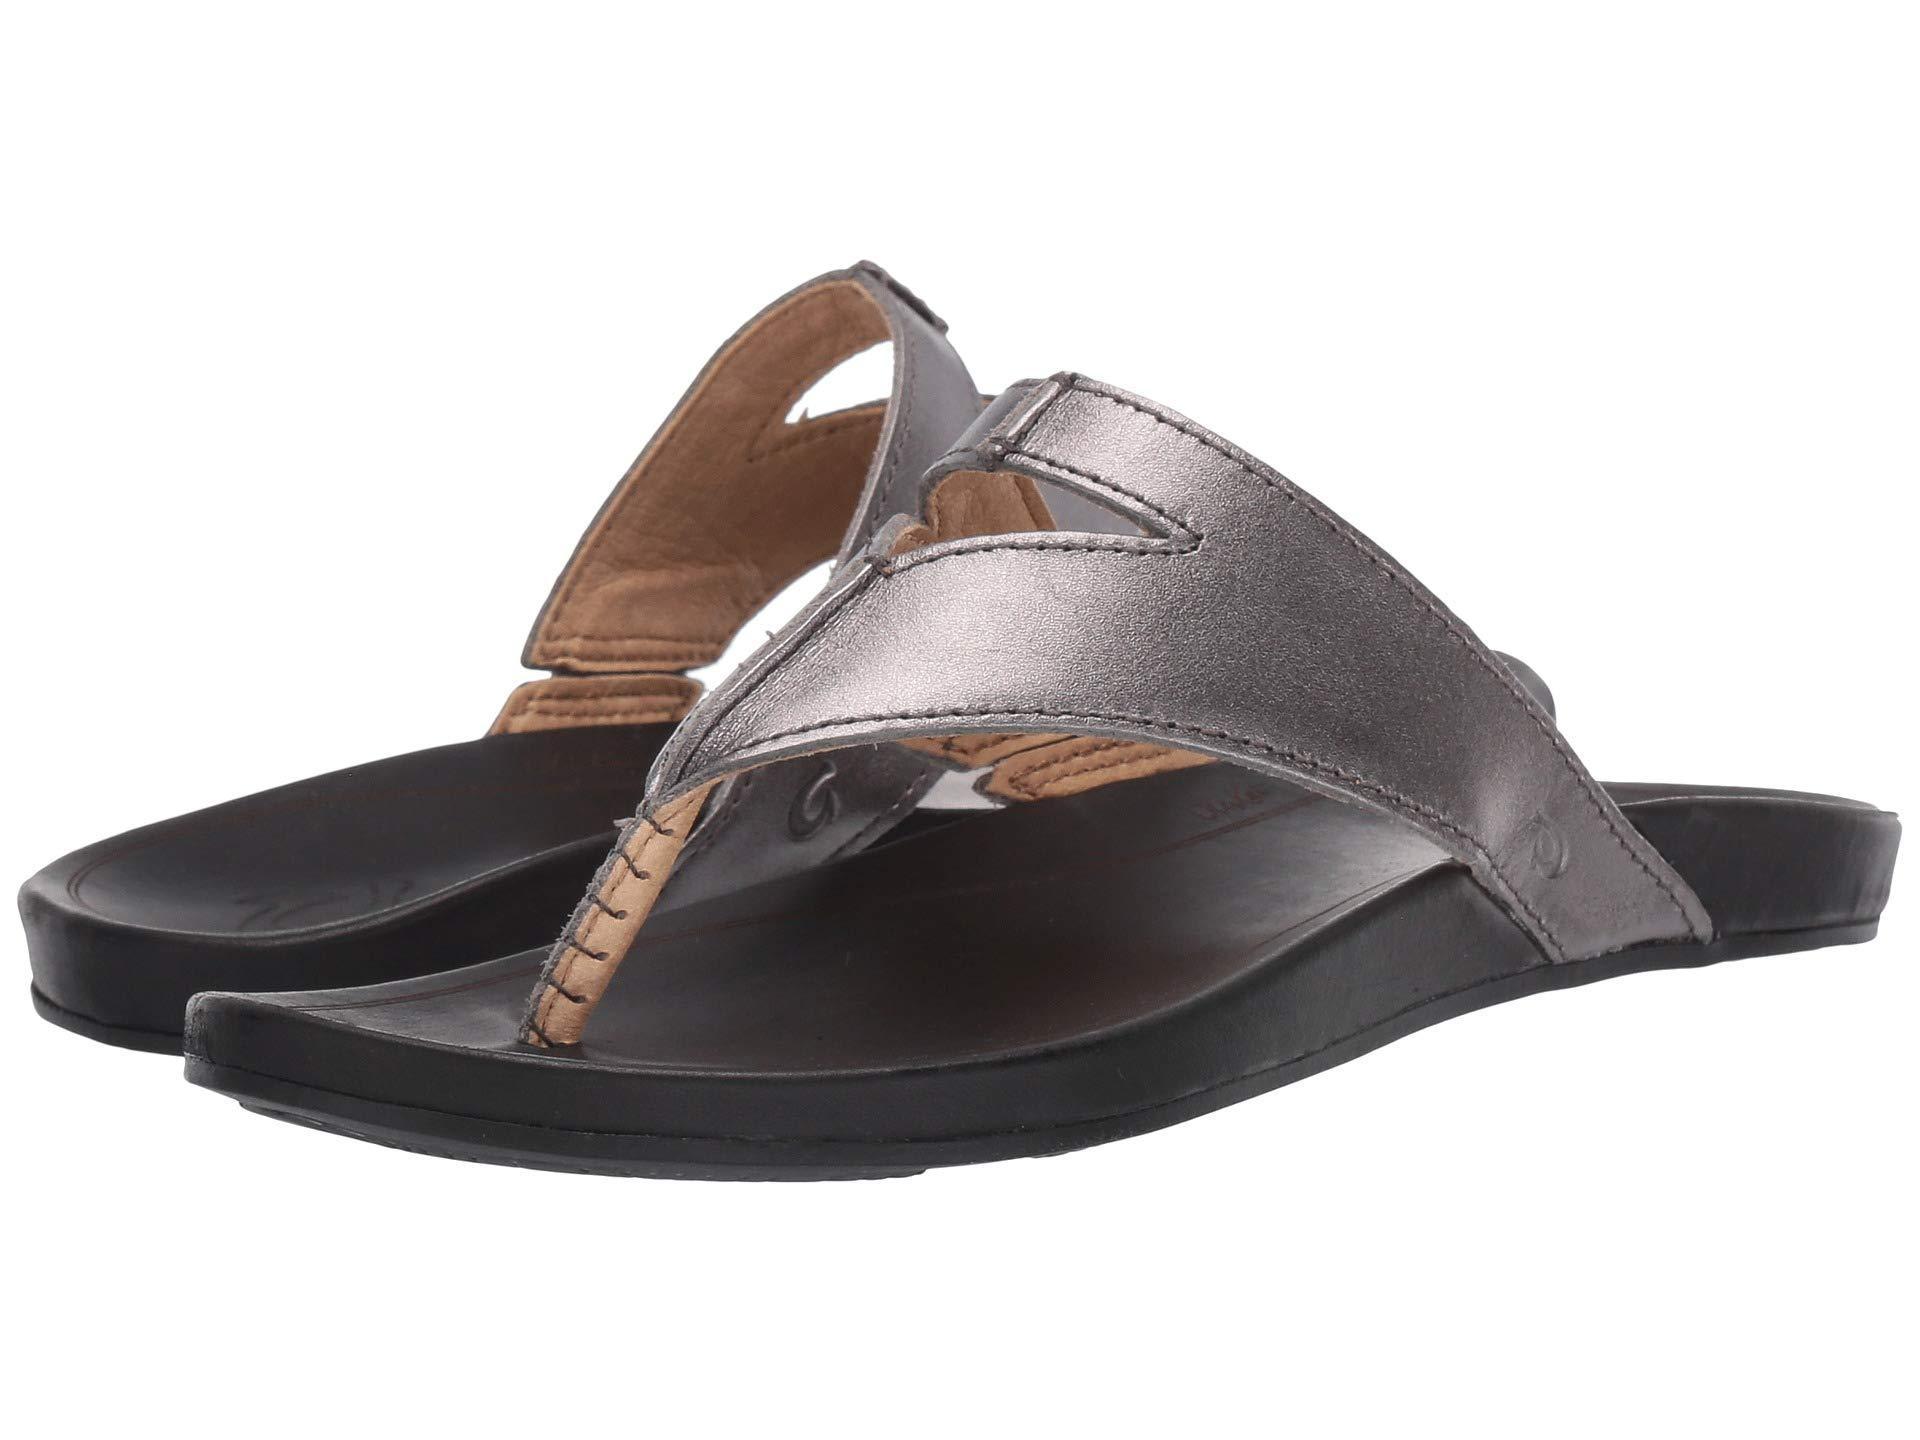 9d2109af5e1d Lyst - Olukai Lala (black tan) Women s Sandals in Black